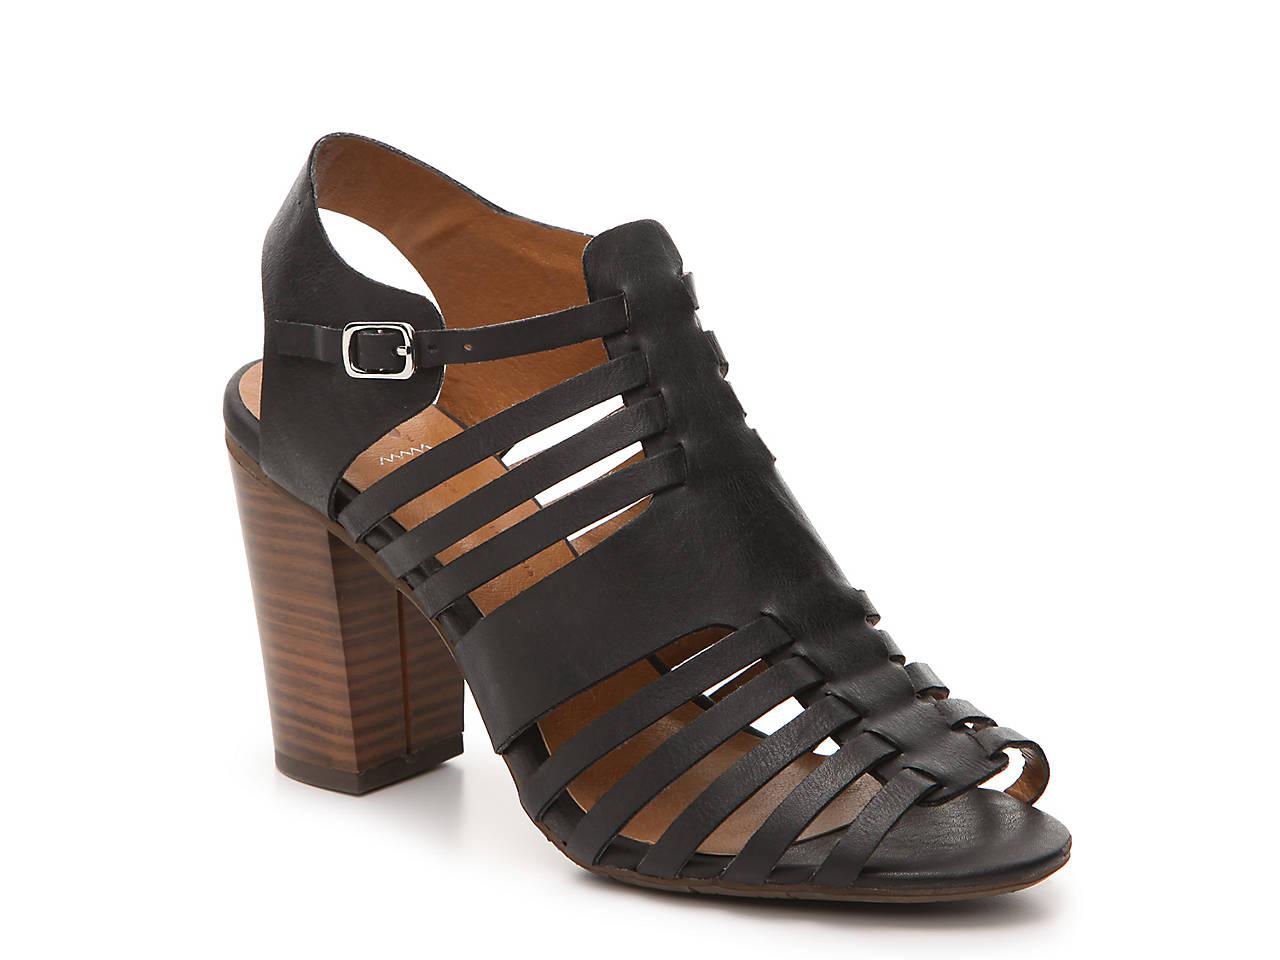 BC Footwear. Rescue Sandal